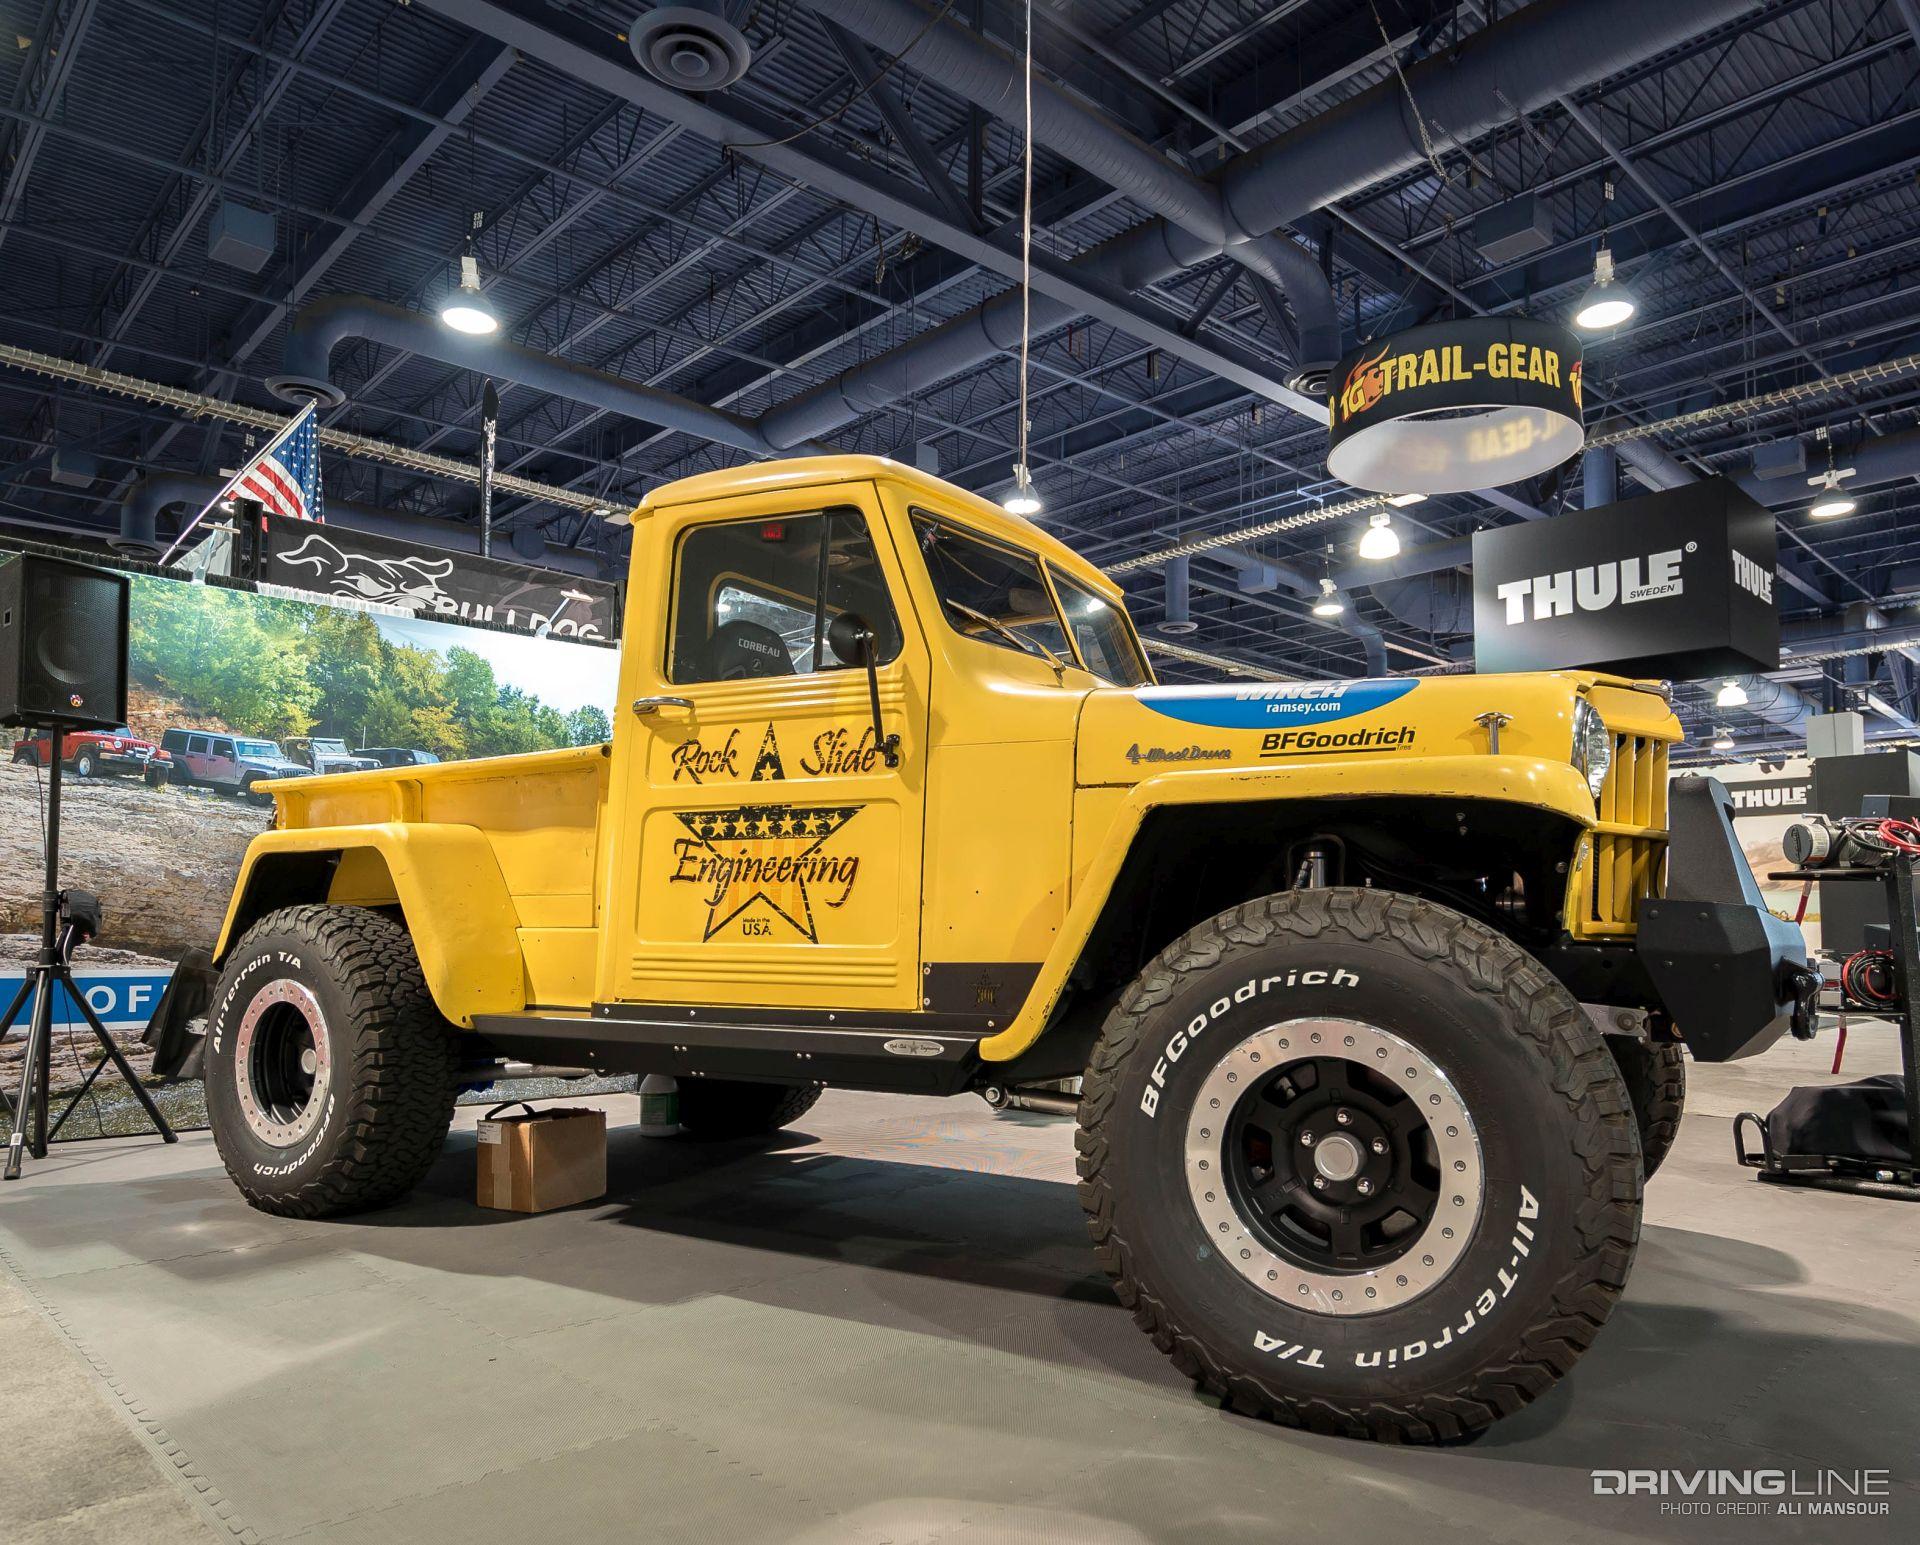 2016 Jeep Wrangler Diesel >> Jeeps of SEMA 2016 [Gallery] | DrivingLine